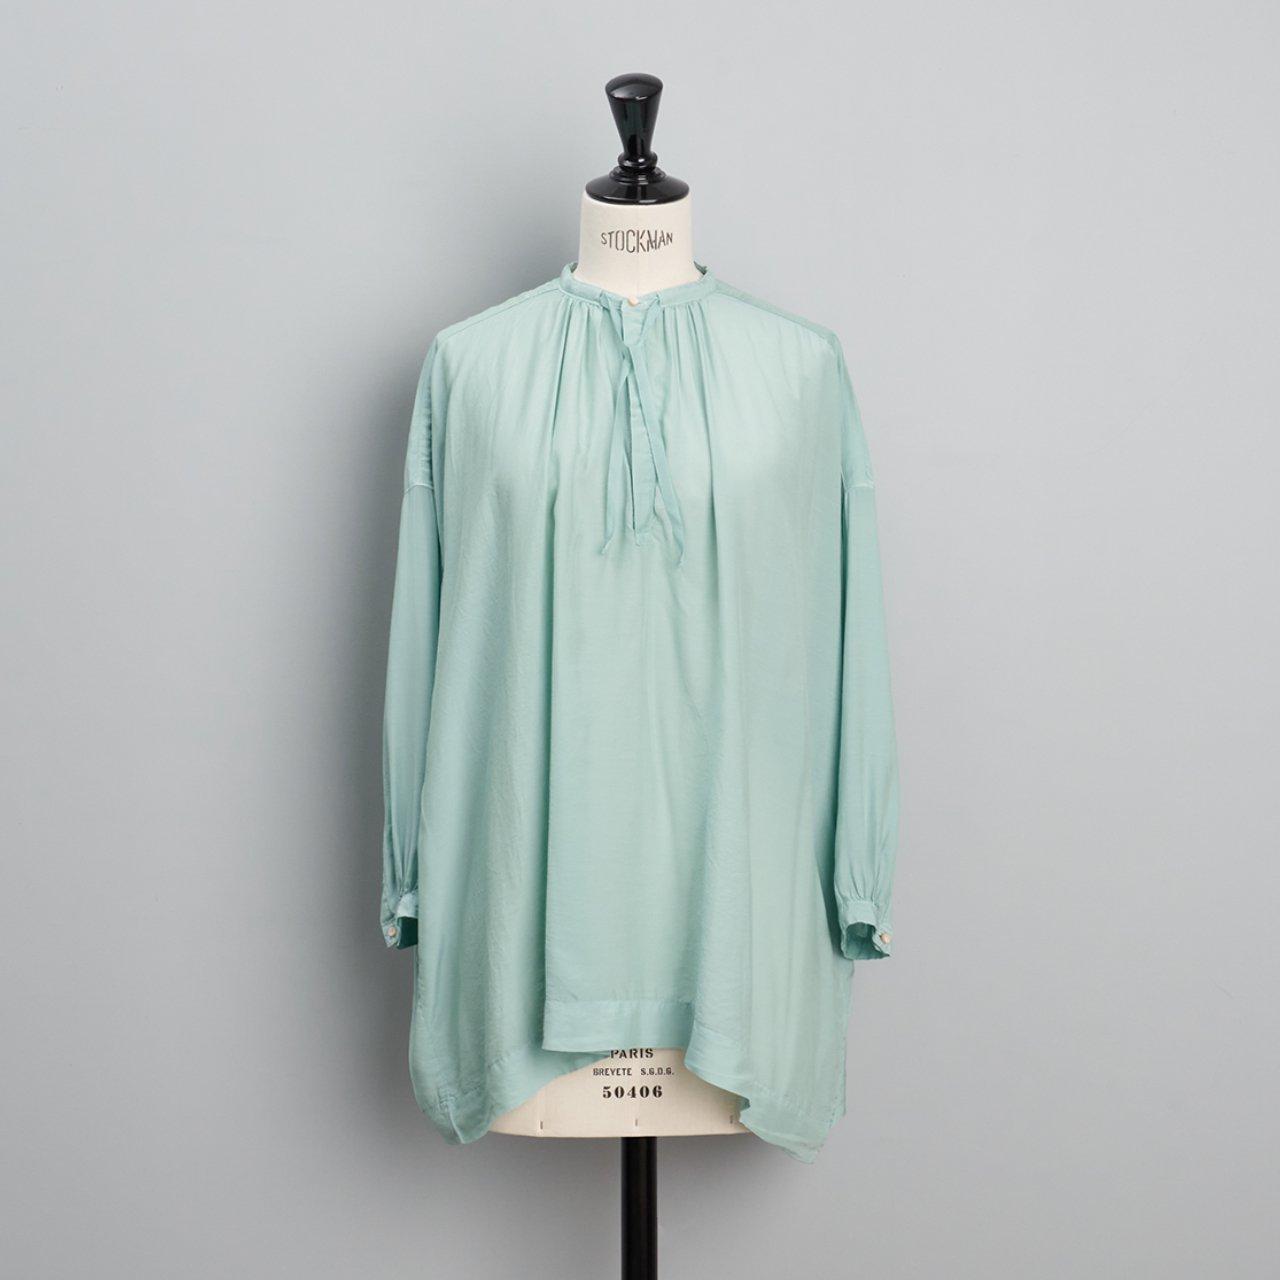 suzuki takayuki<BR>slip-on blouse<BR>Spray green